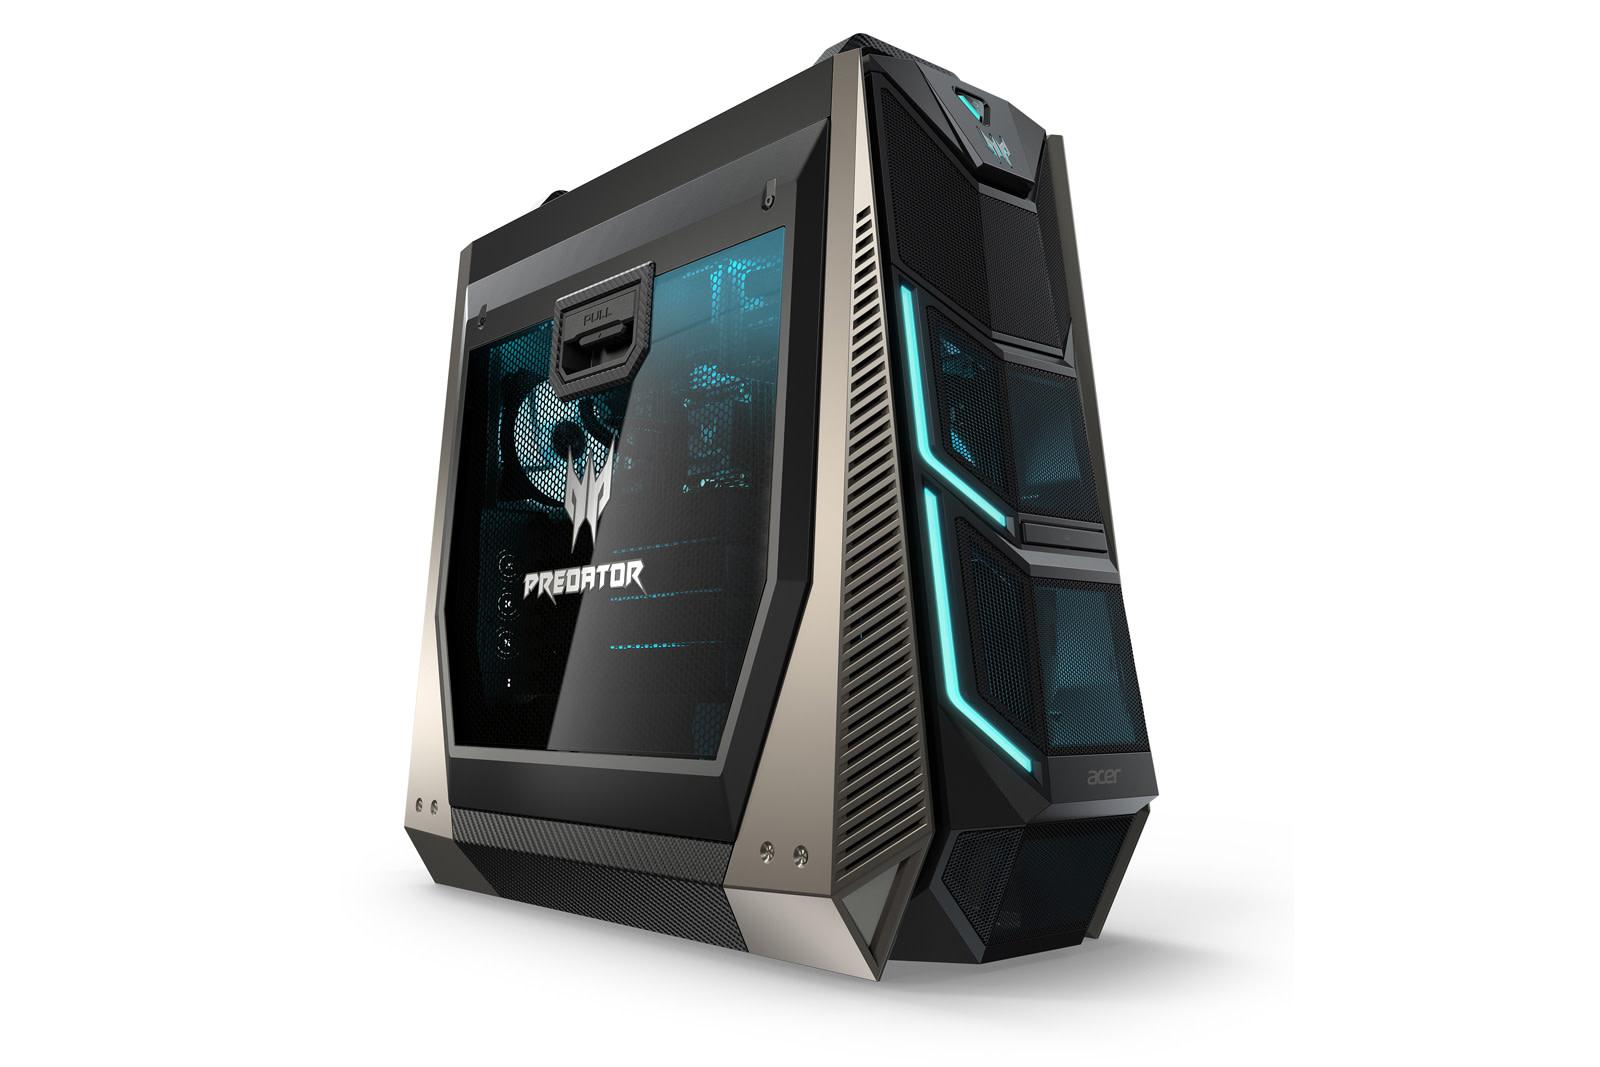 Acers New Gaming PCs Include An 18 Core Liquid Cooled Desktop